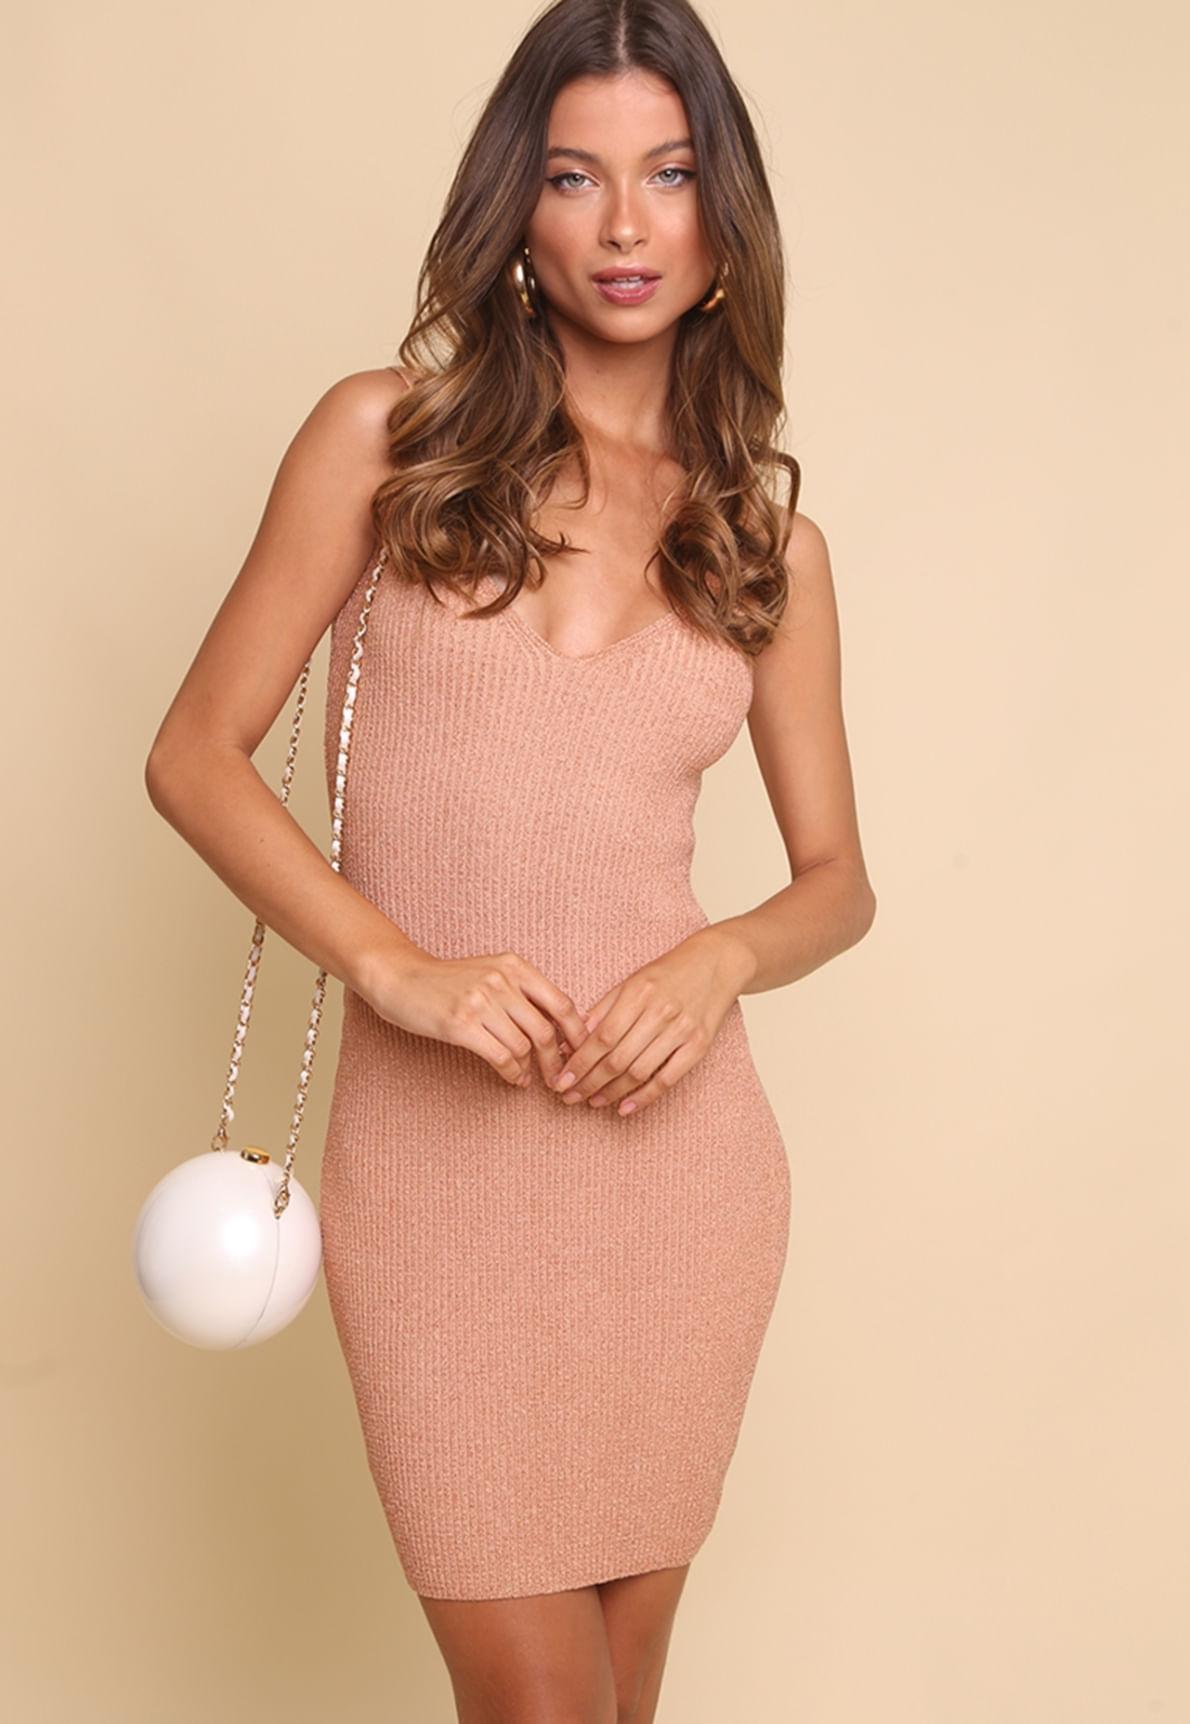 27747-vestido-rose-trico-giordana-mundo-lolita-01